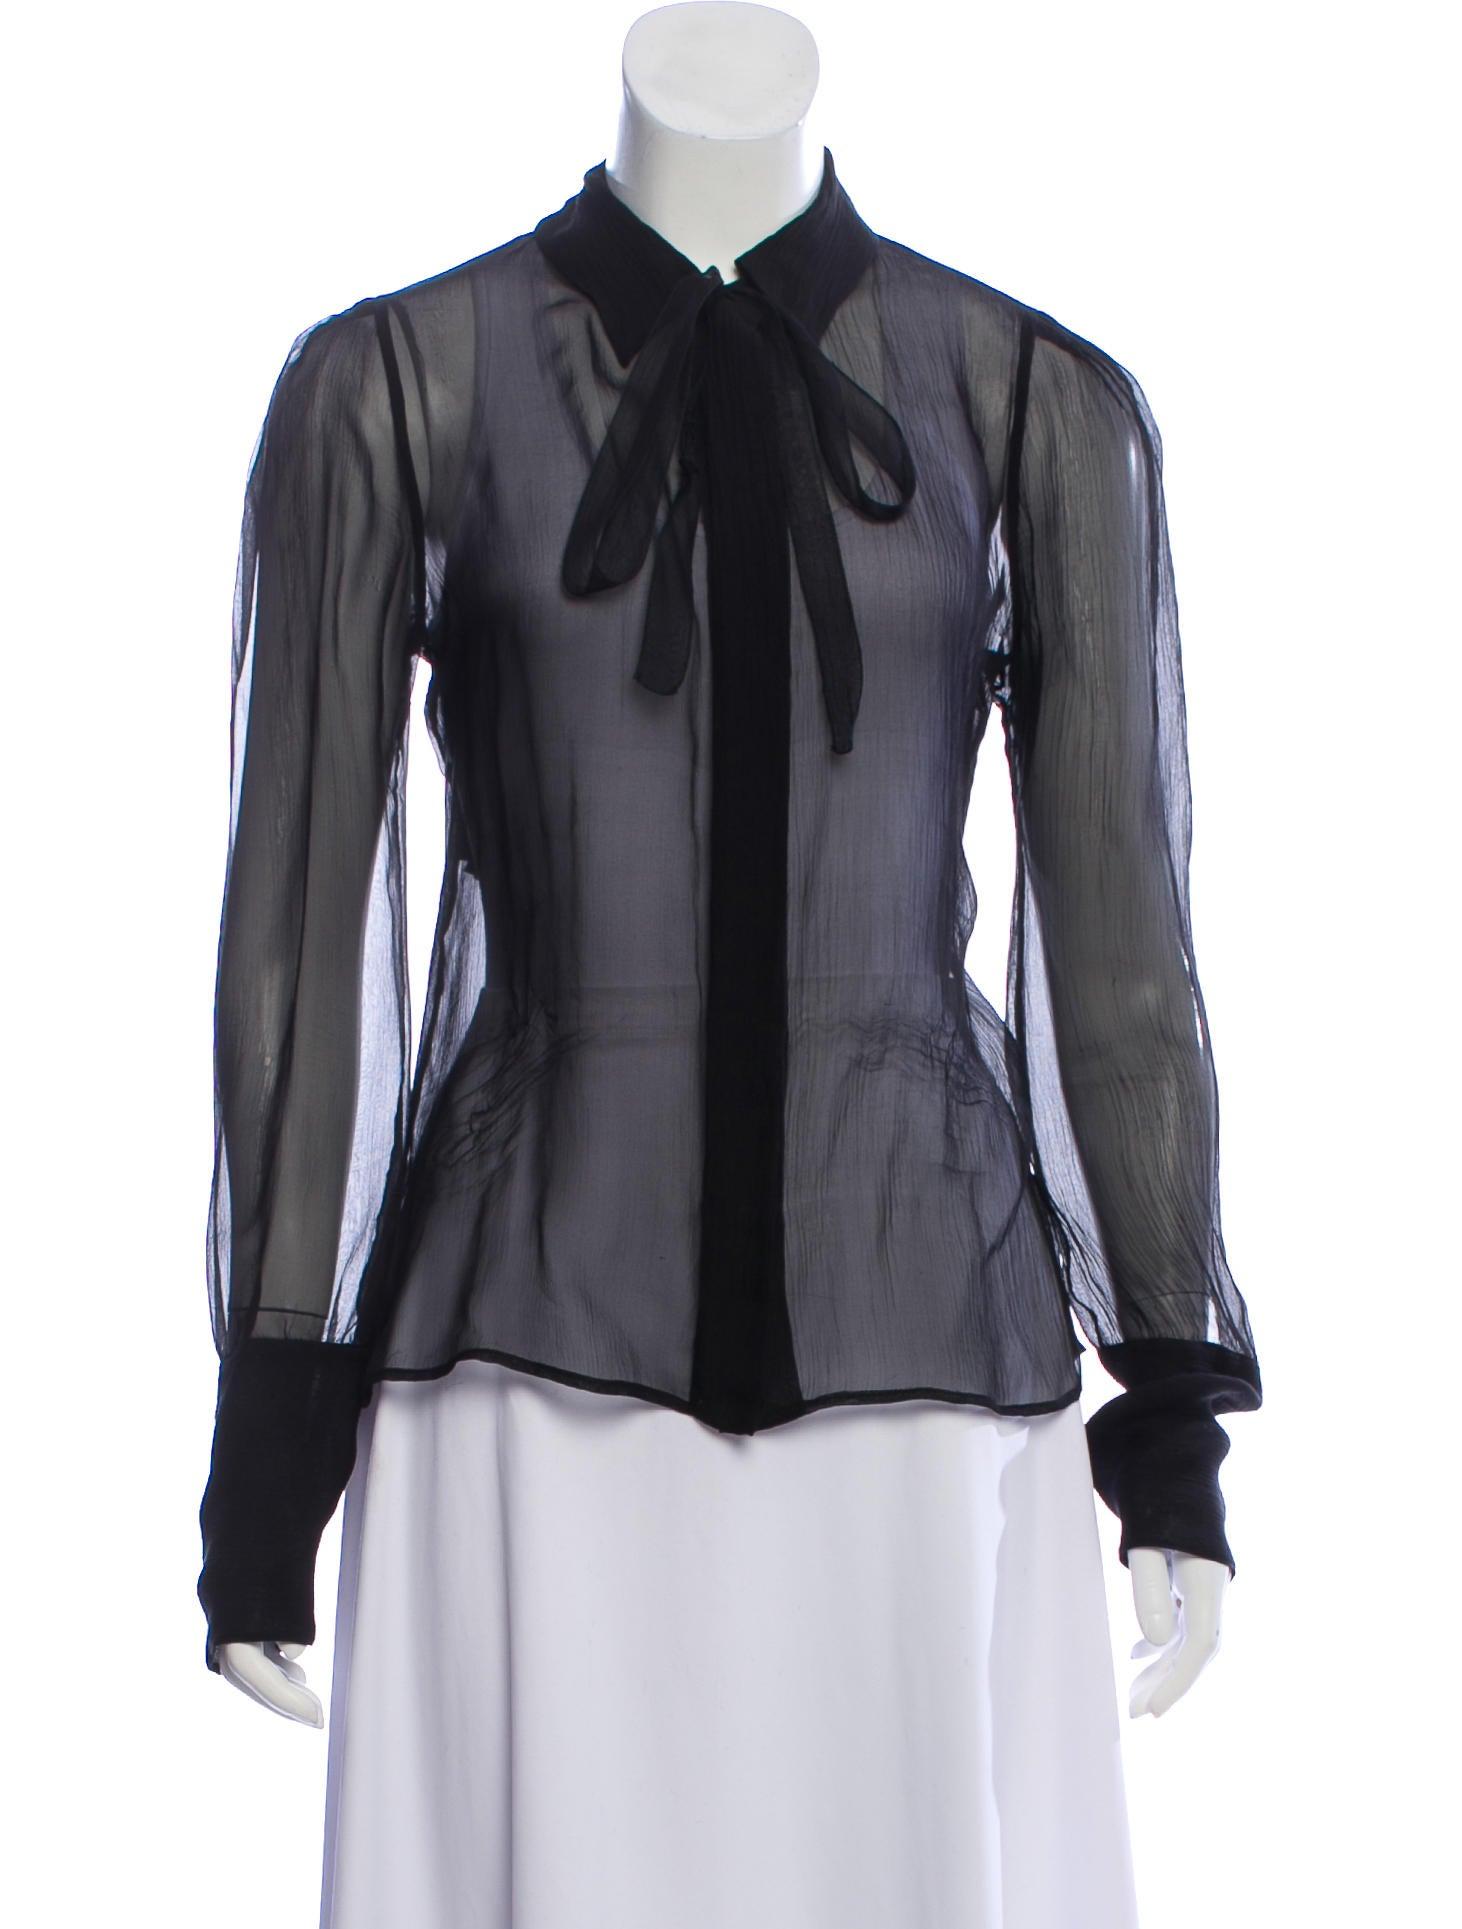 01a727f2db5faa Prada Silk Long Sleeve Top - Clothing - PRA269875